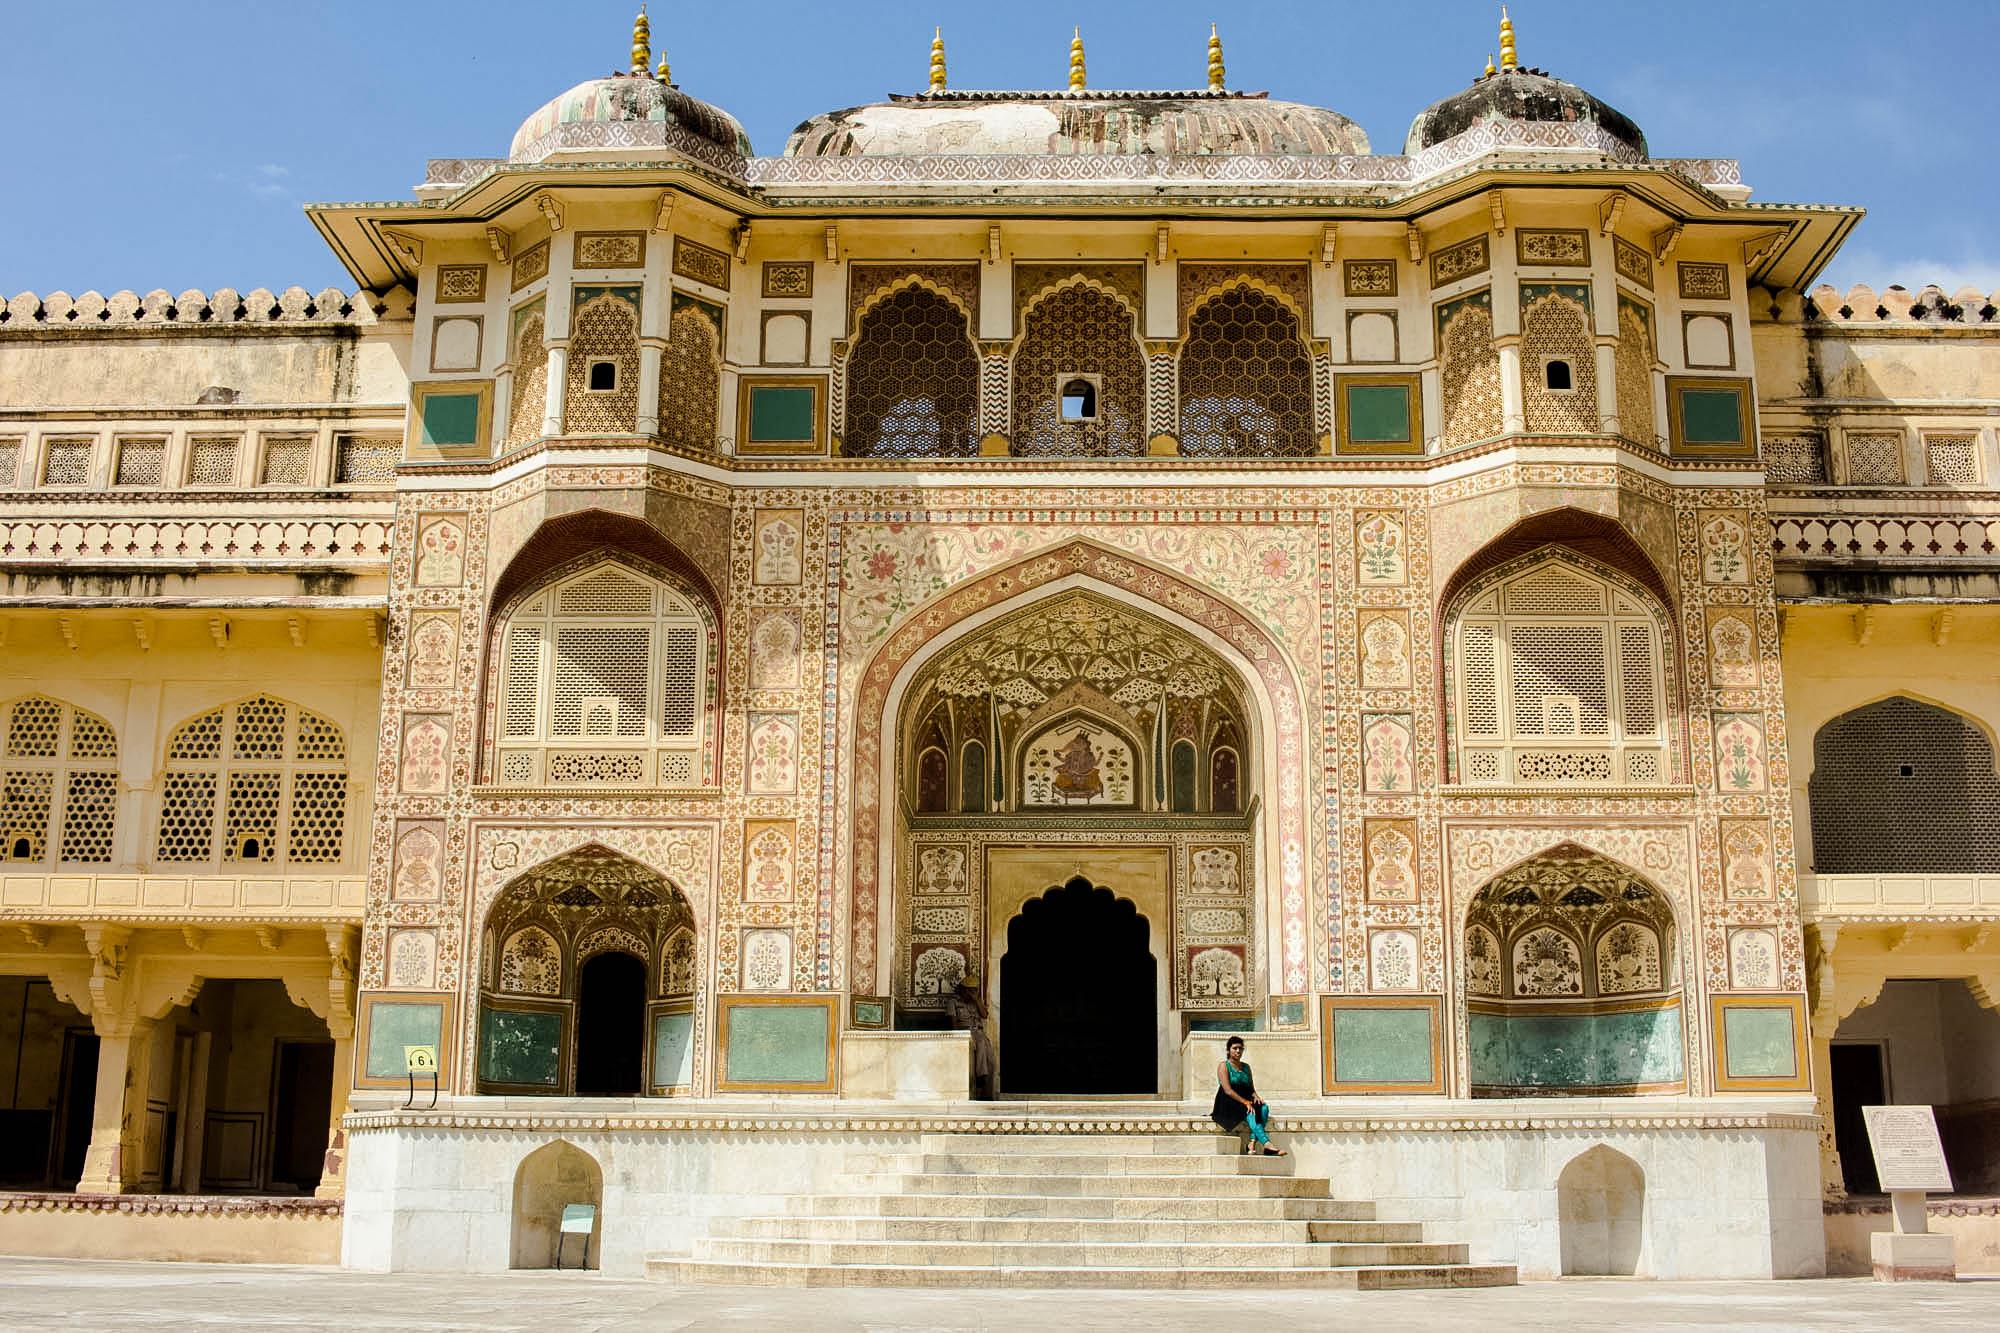 golden triangle rajasthan taj mahal jaipur delhi india tips must see kathi kamleitner travelettes-22